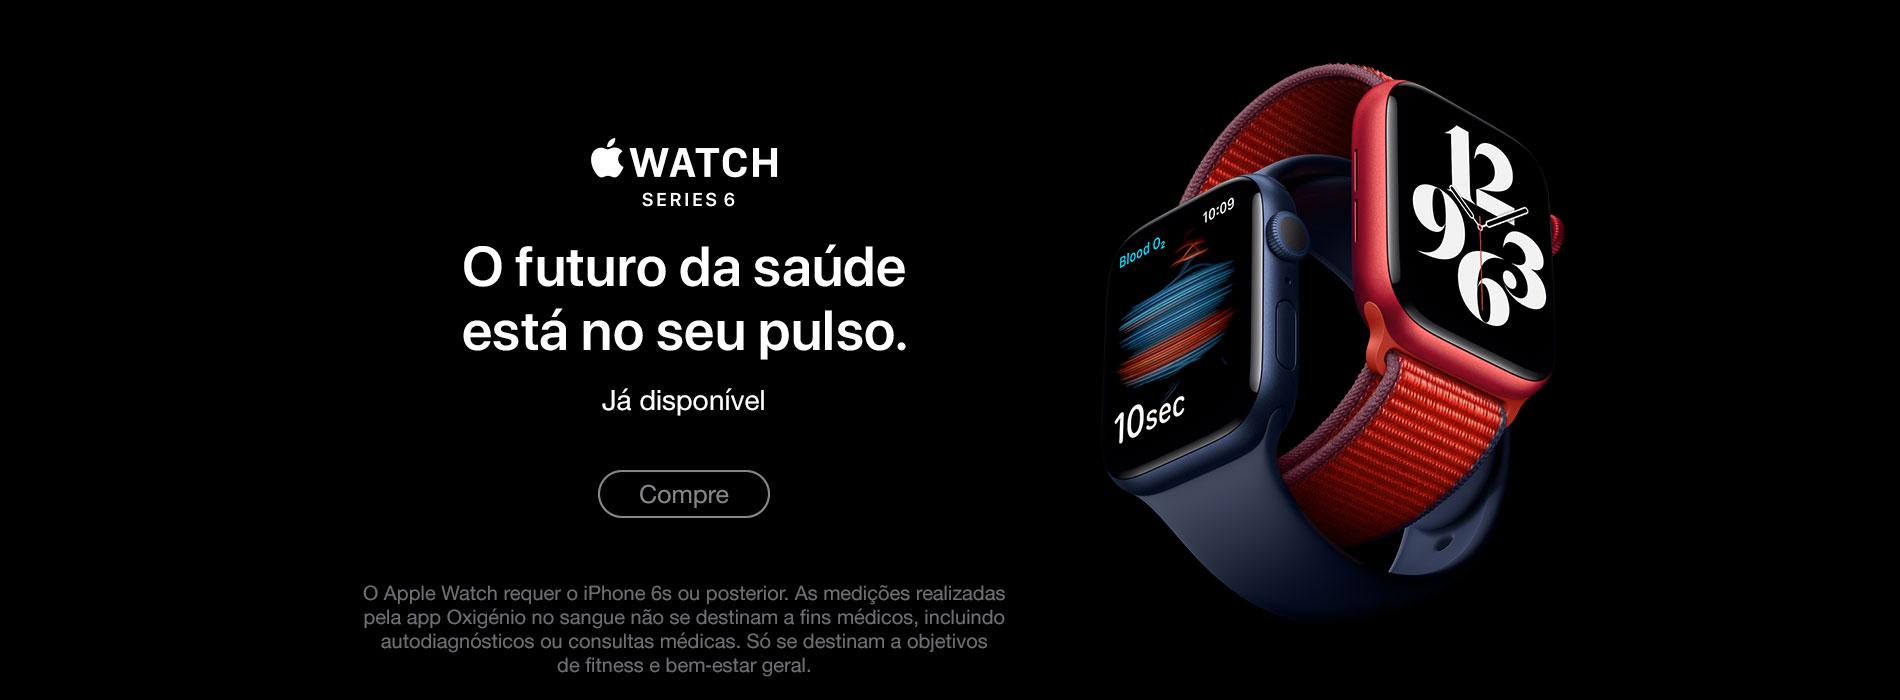 Homepage Slideshow - Watch S6